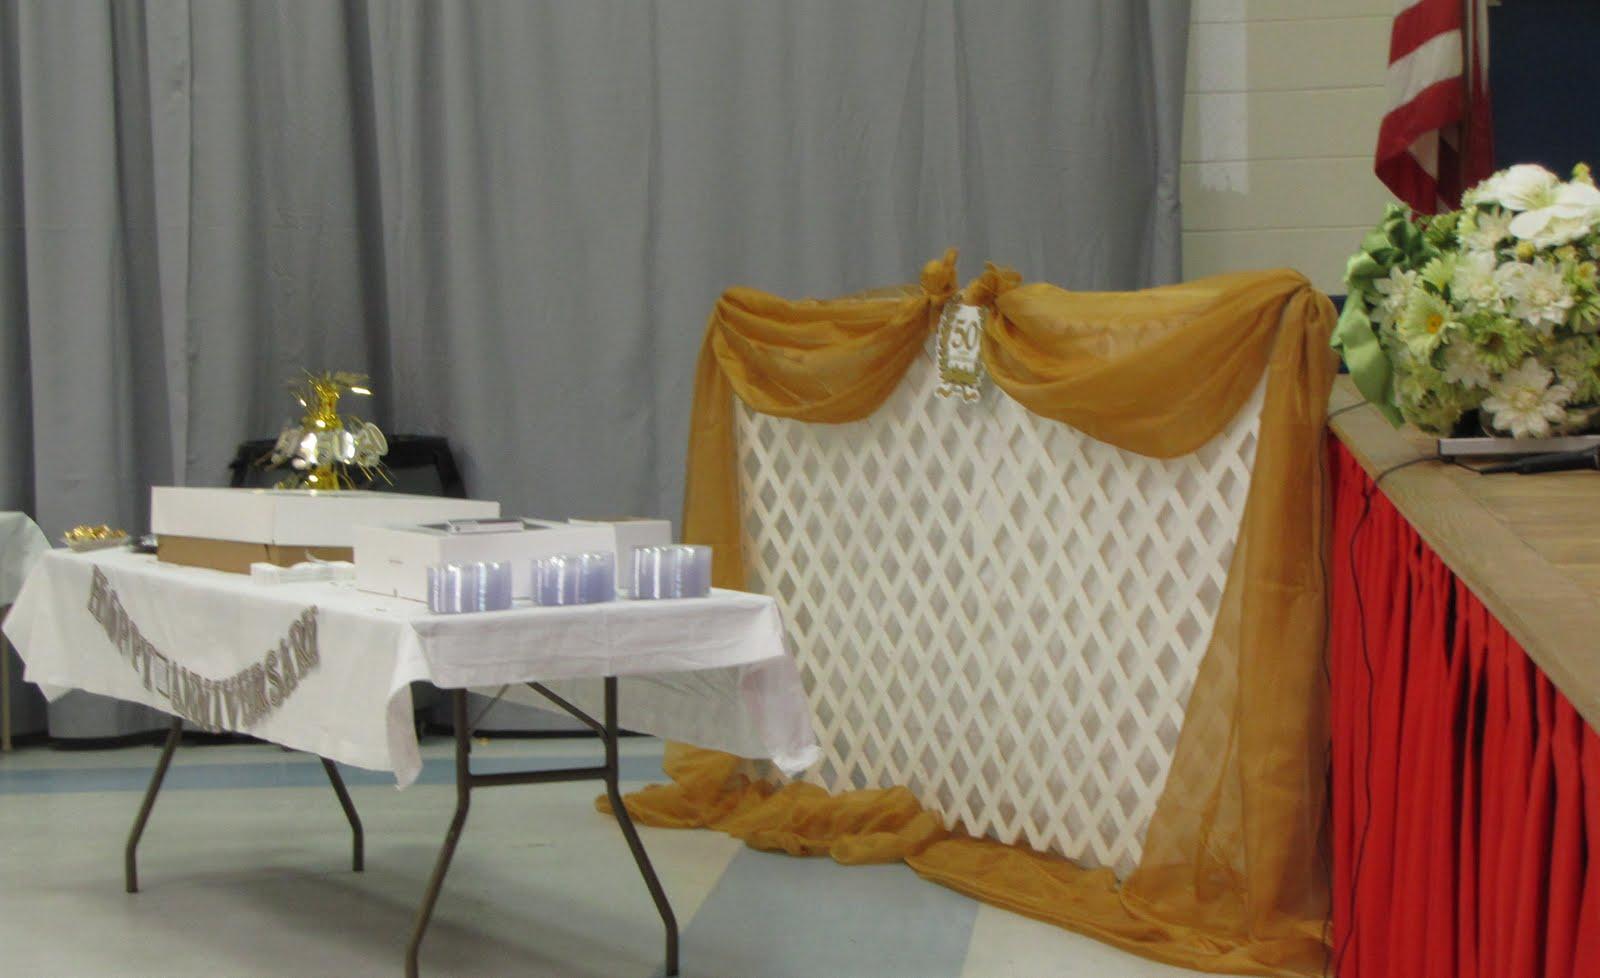 Bintous blog 50th wedding invite ideas 50th anniversary family junglespirit Choice Image